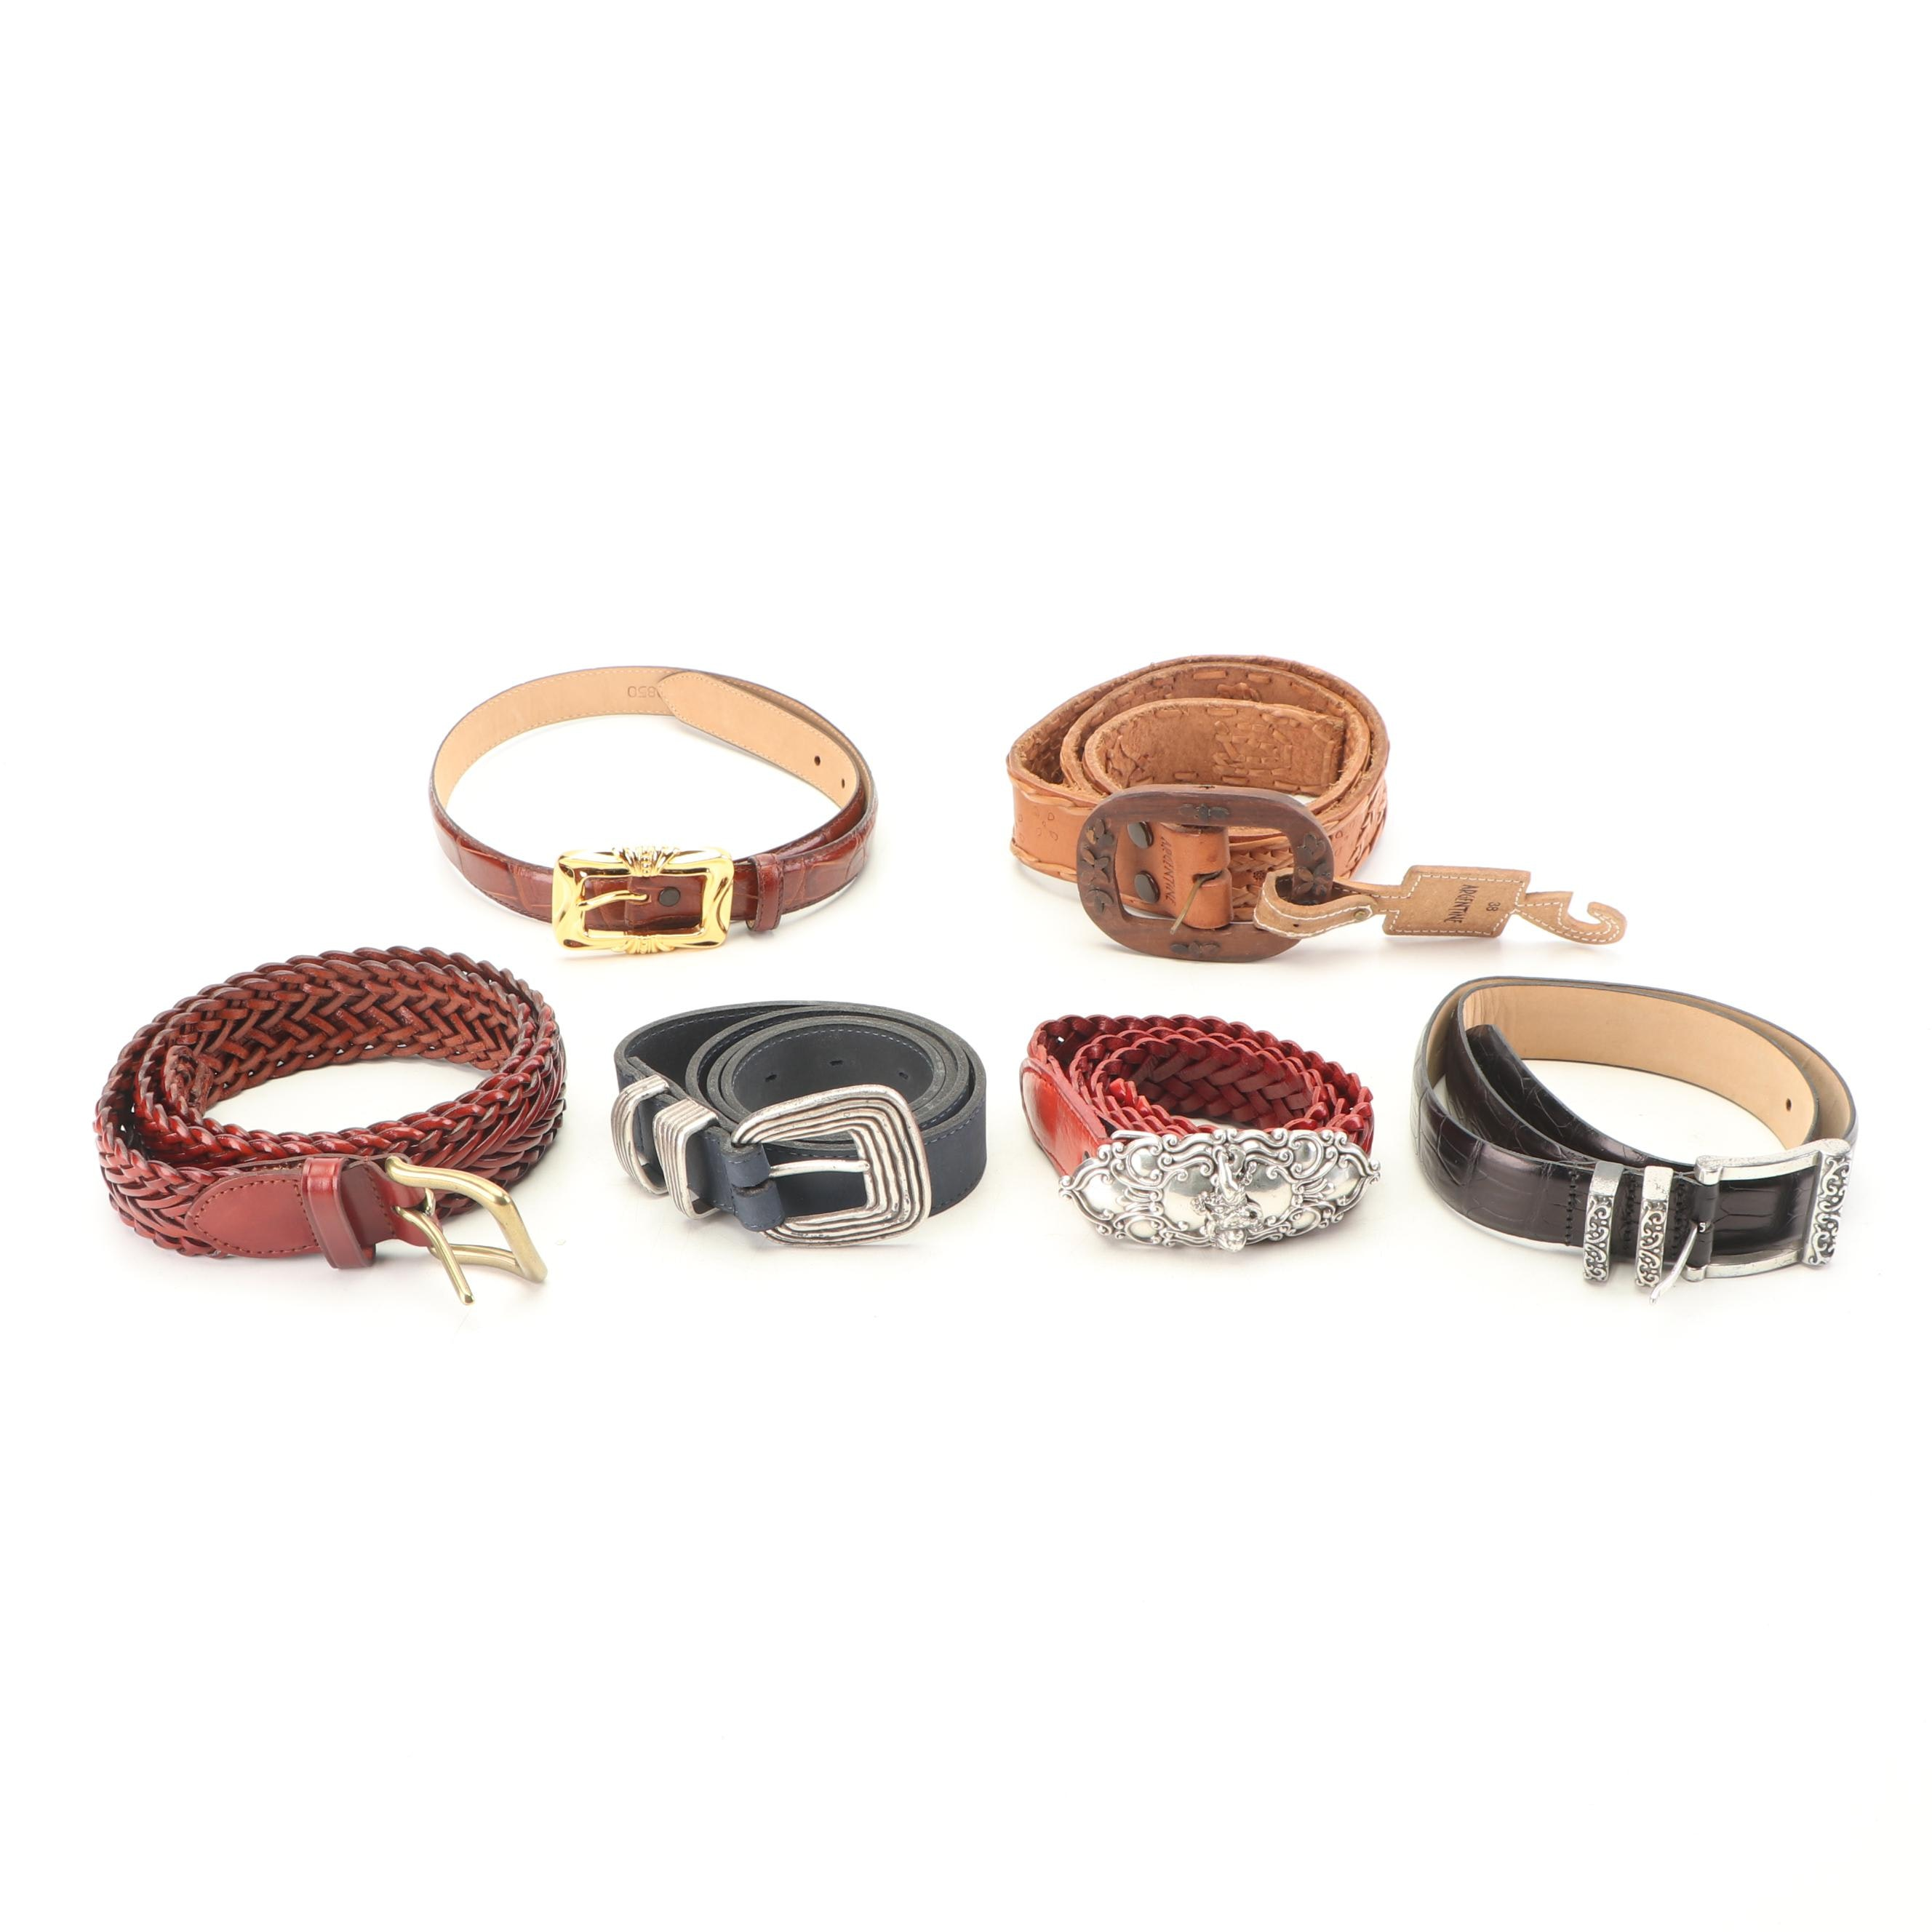 Women's Leather Belts Including Enmom, 1990s